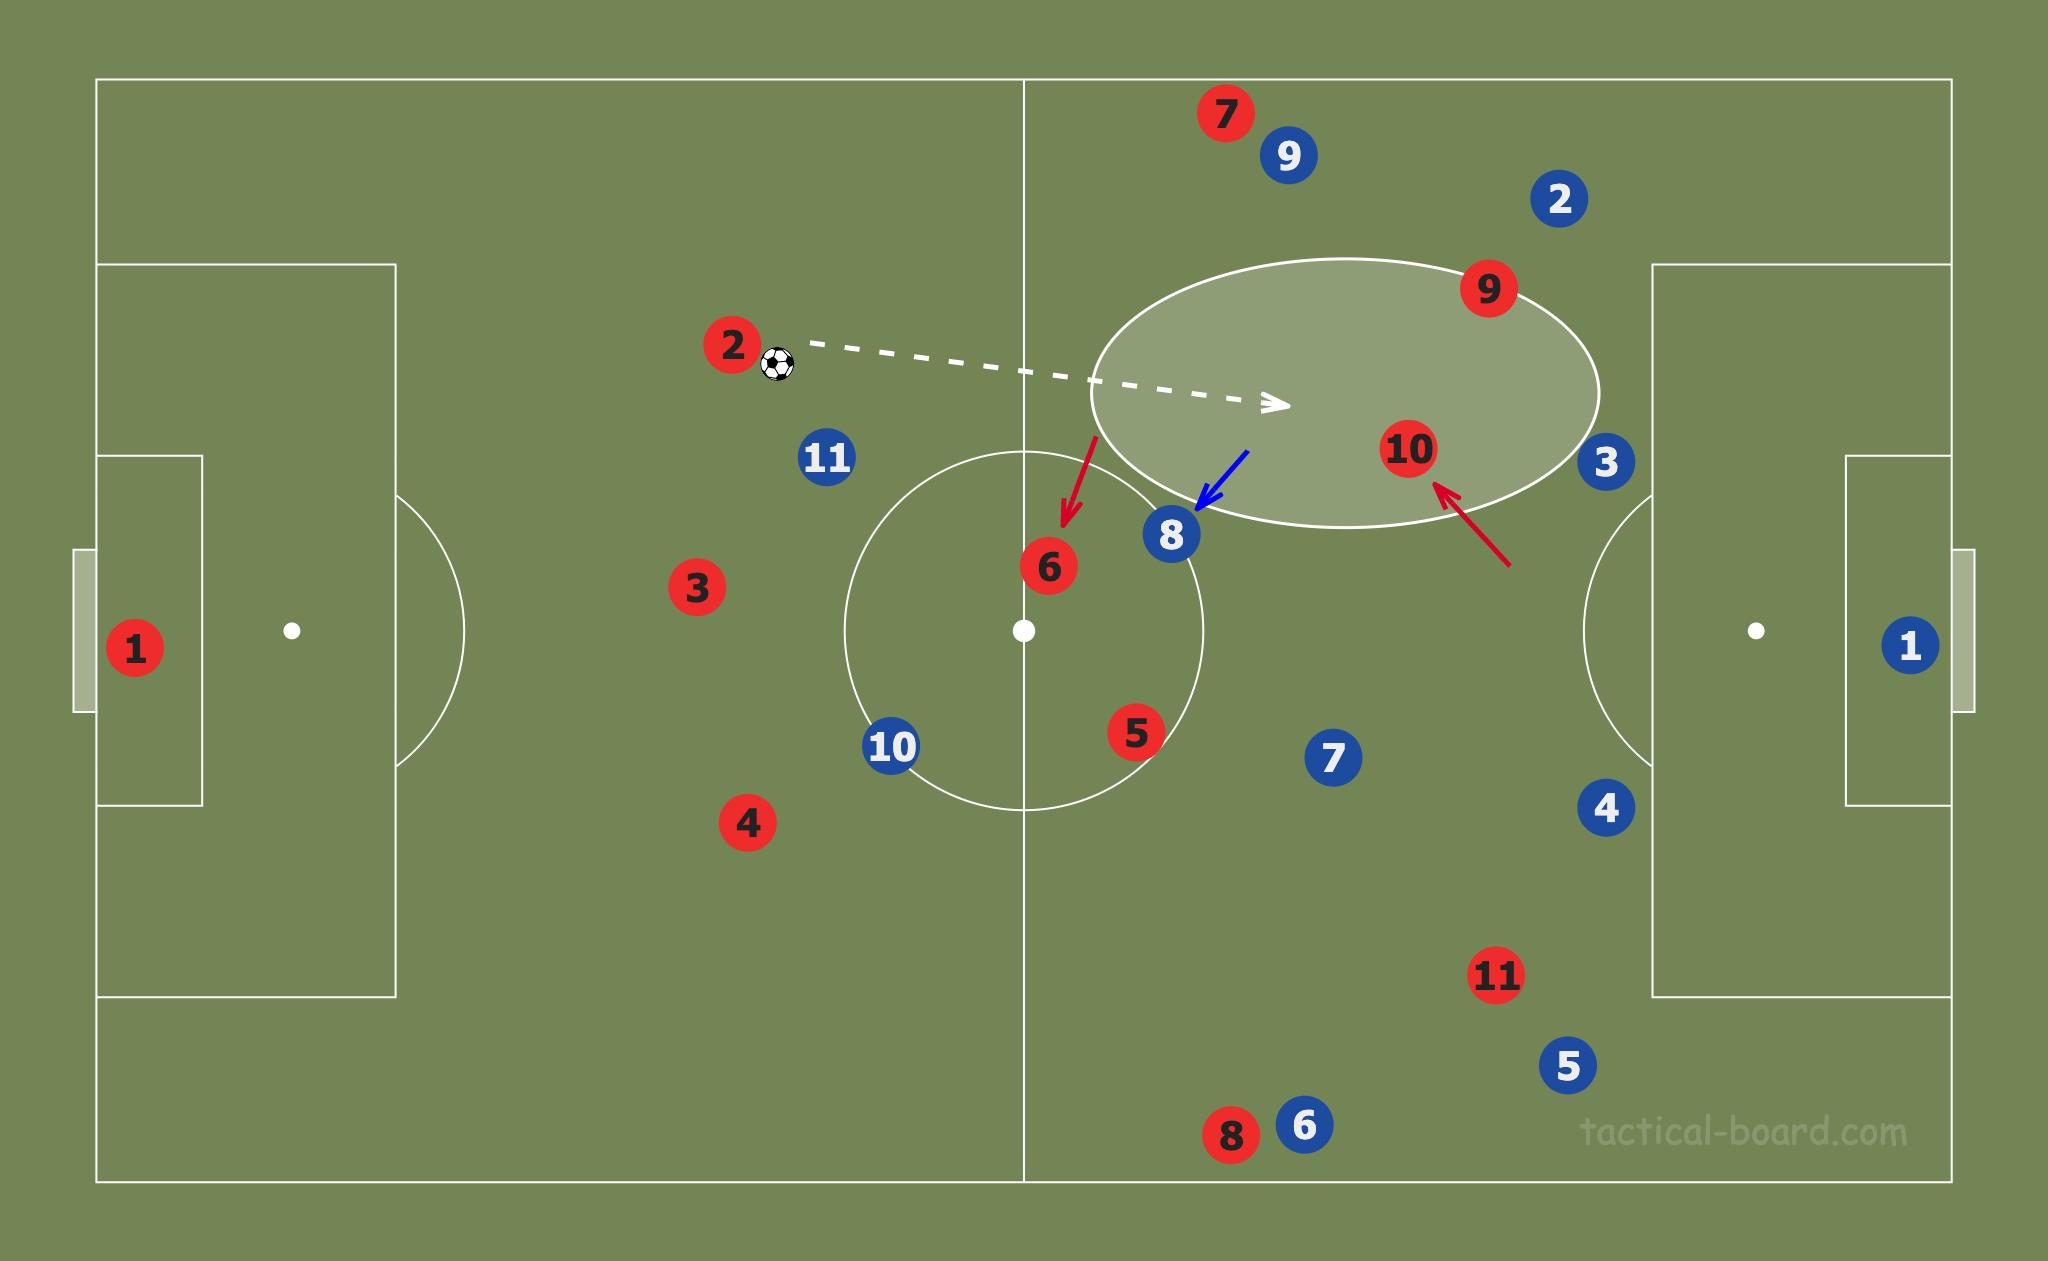 UEFA Champions League 2019/20: Tottenham Hotspur vs RB Leipzig – tactical analysis tactics